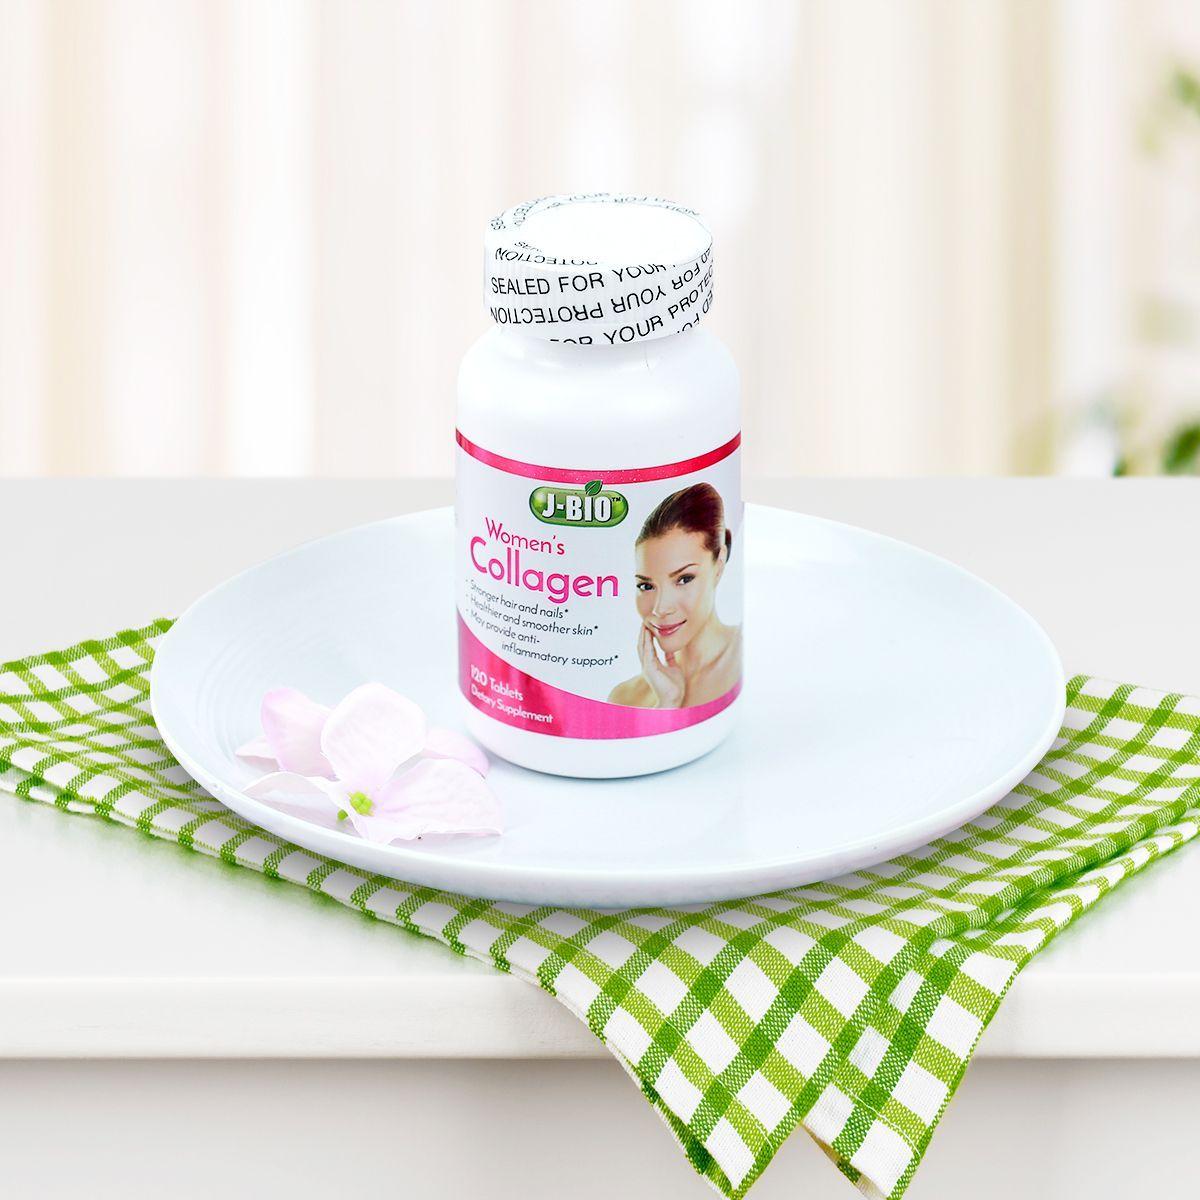 LADIES_Skin health is only the beginning. Collagen has